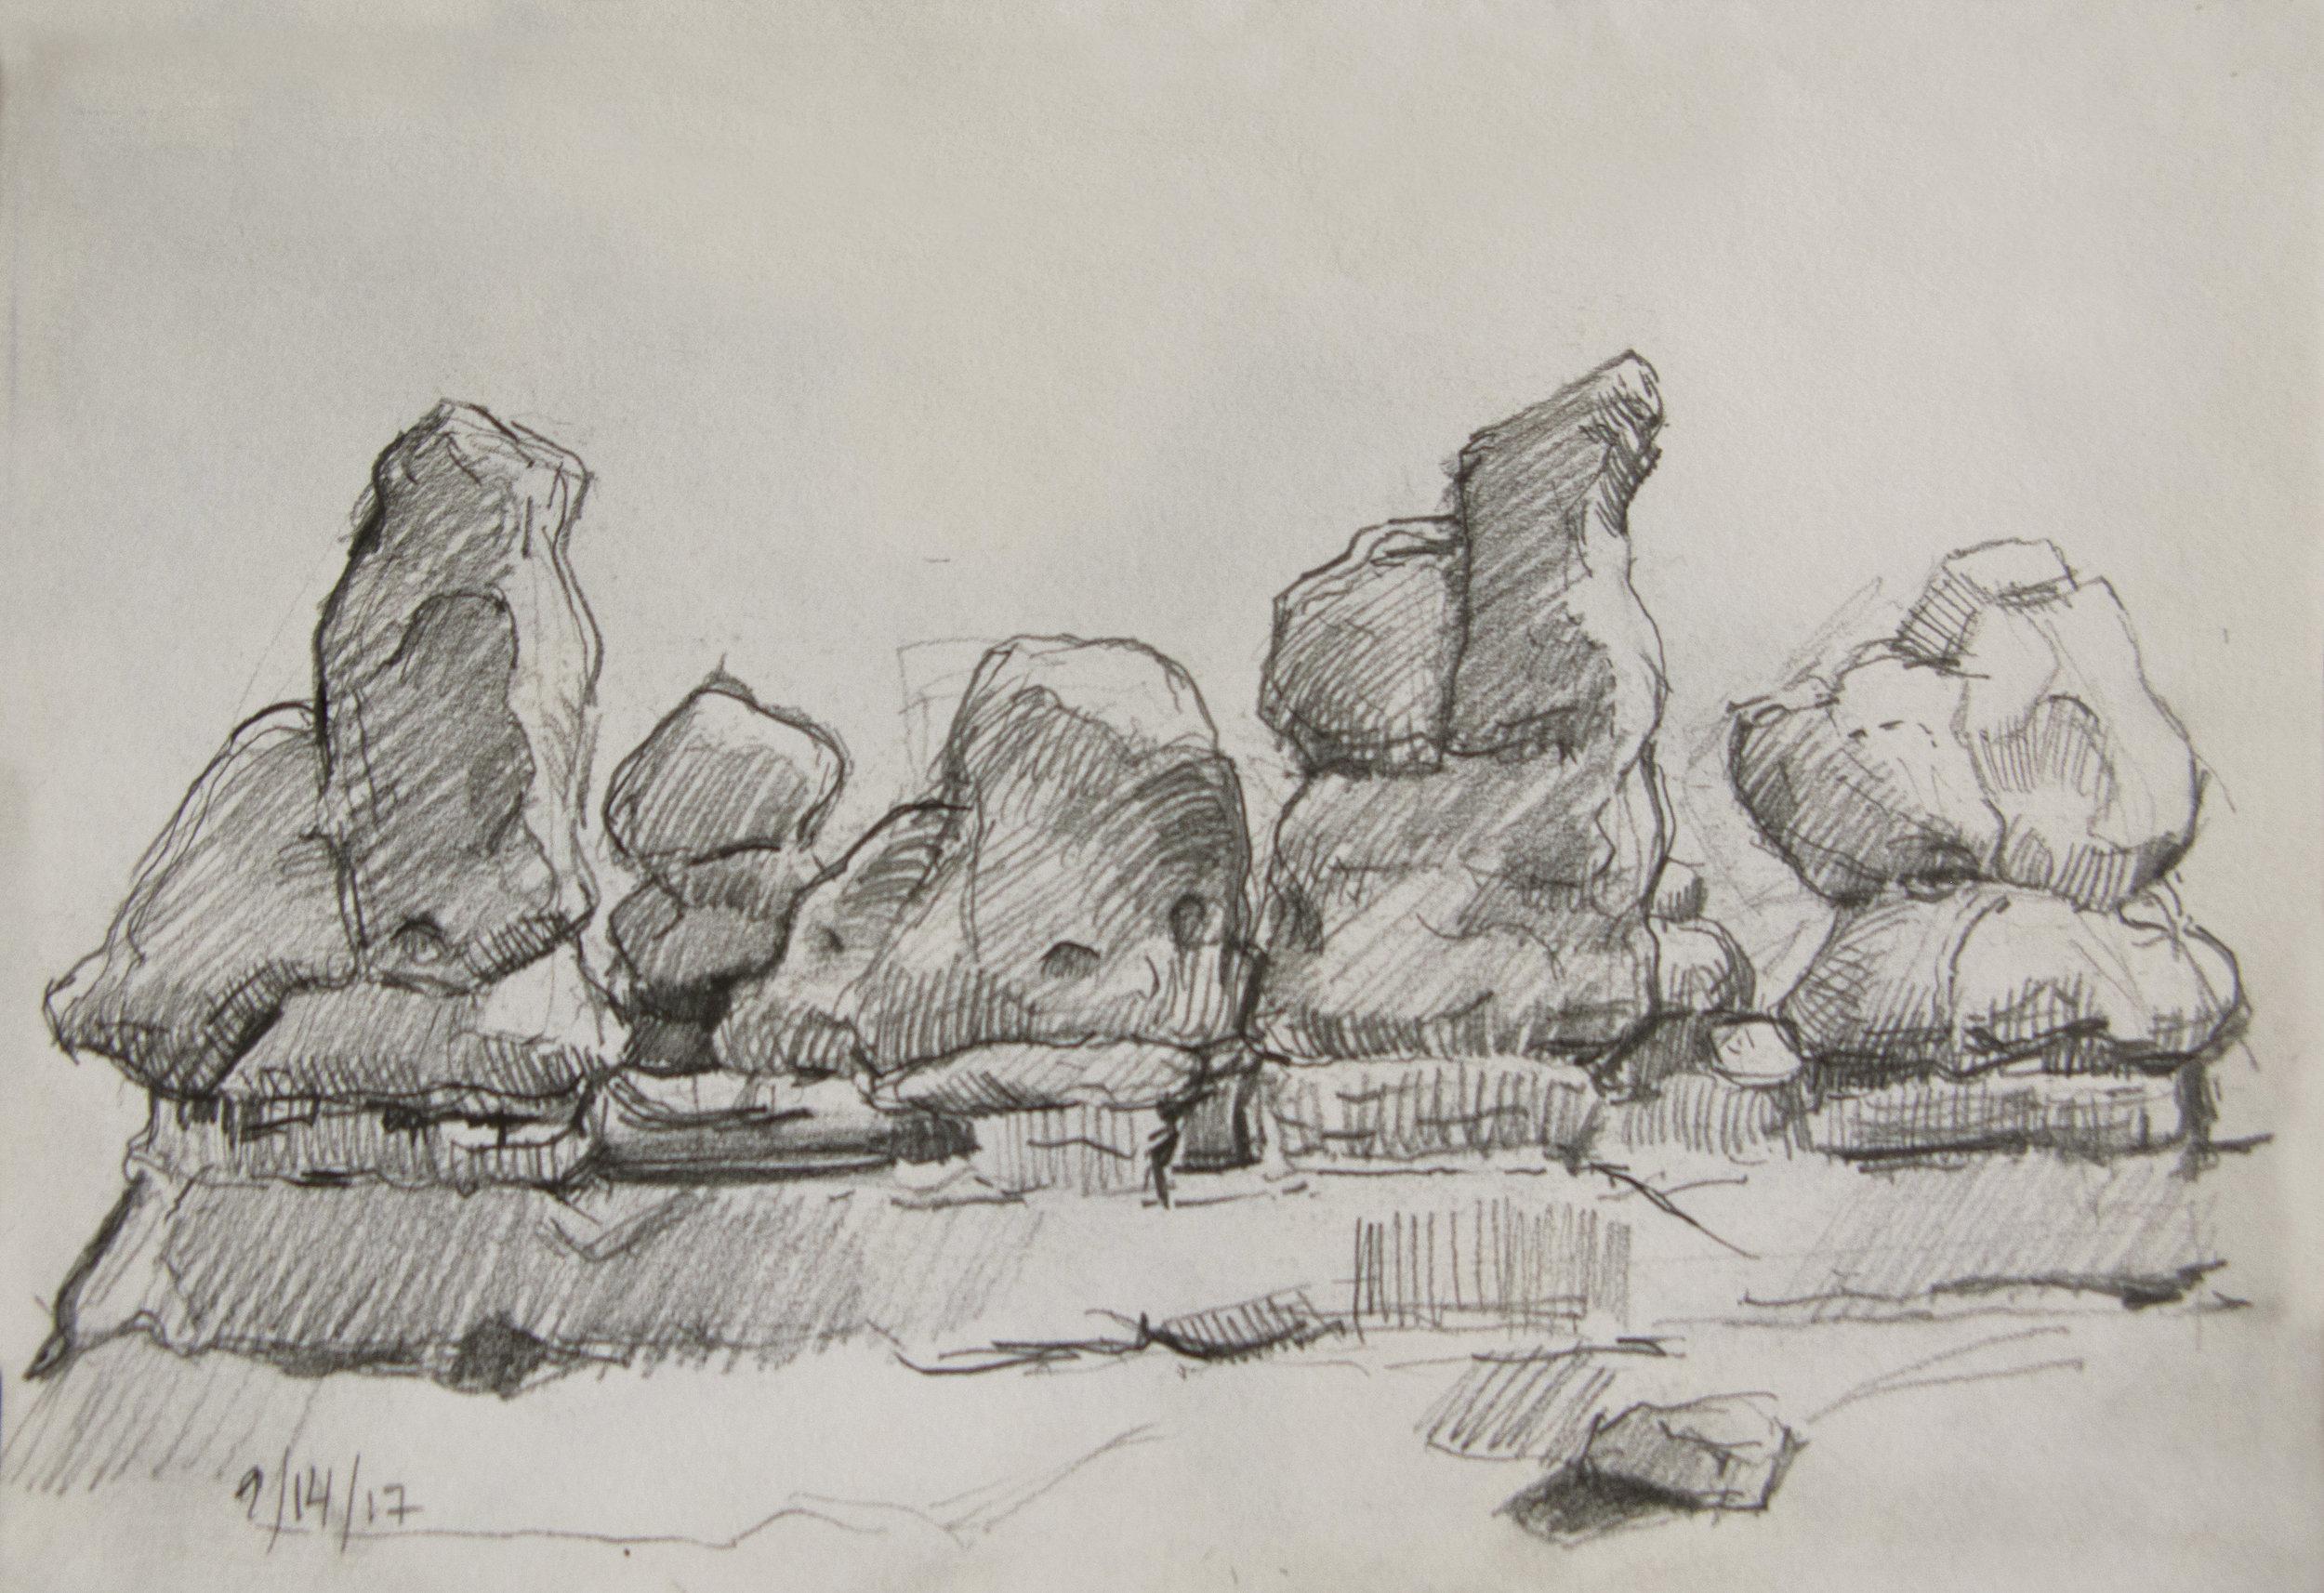 Goblin Valley,  pencil, , 5.5 x 8.5, 2017